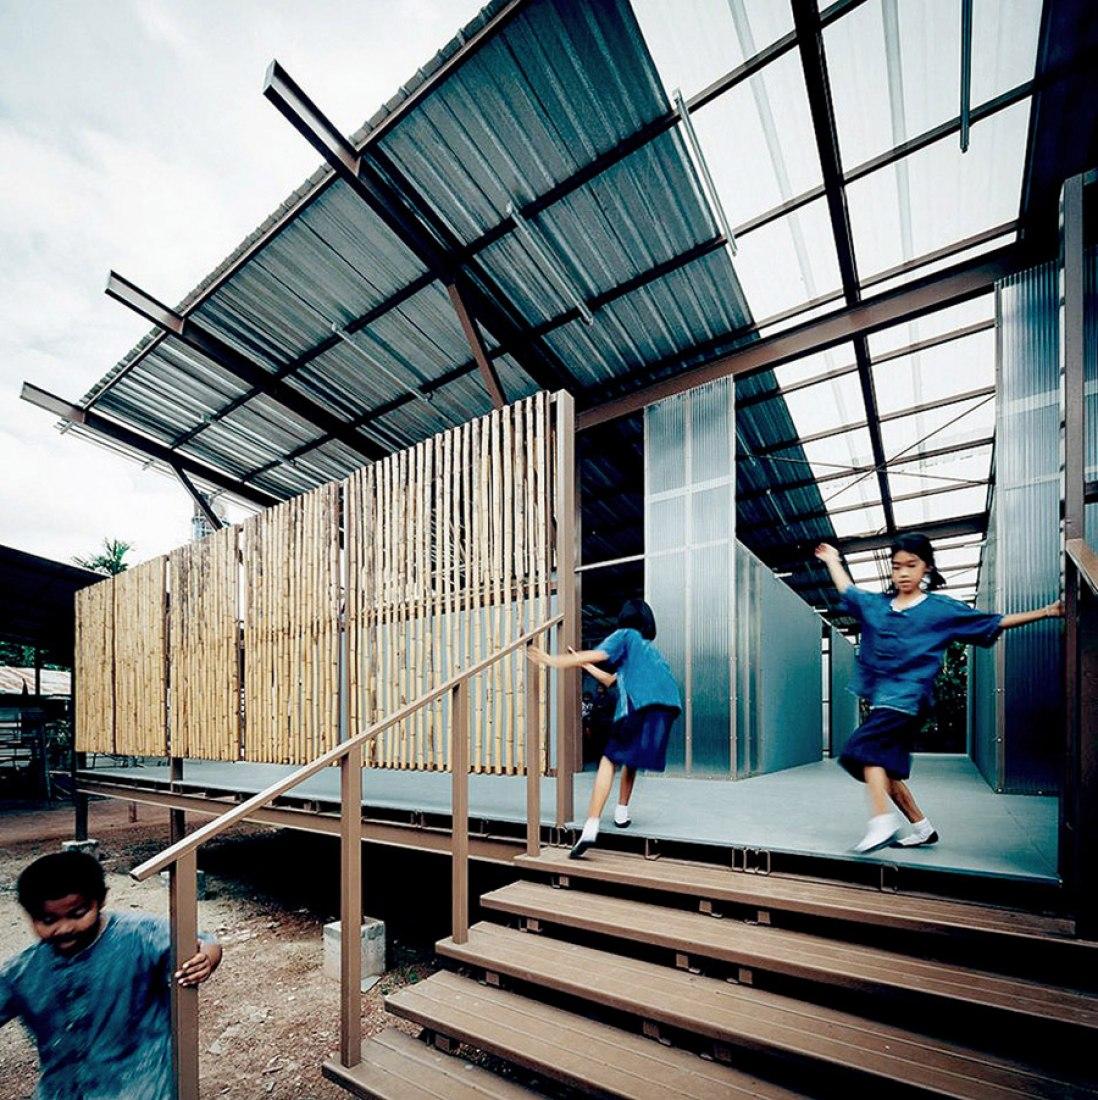 Baan Honghua school by Jun Sekino. Photograph © Spaceshift Studio.